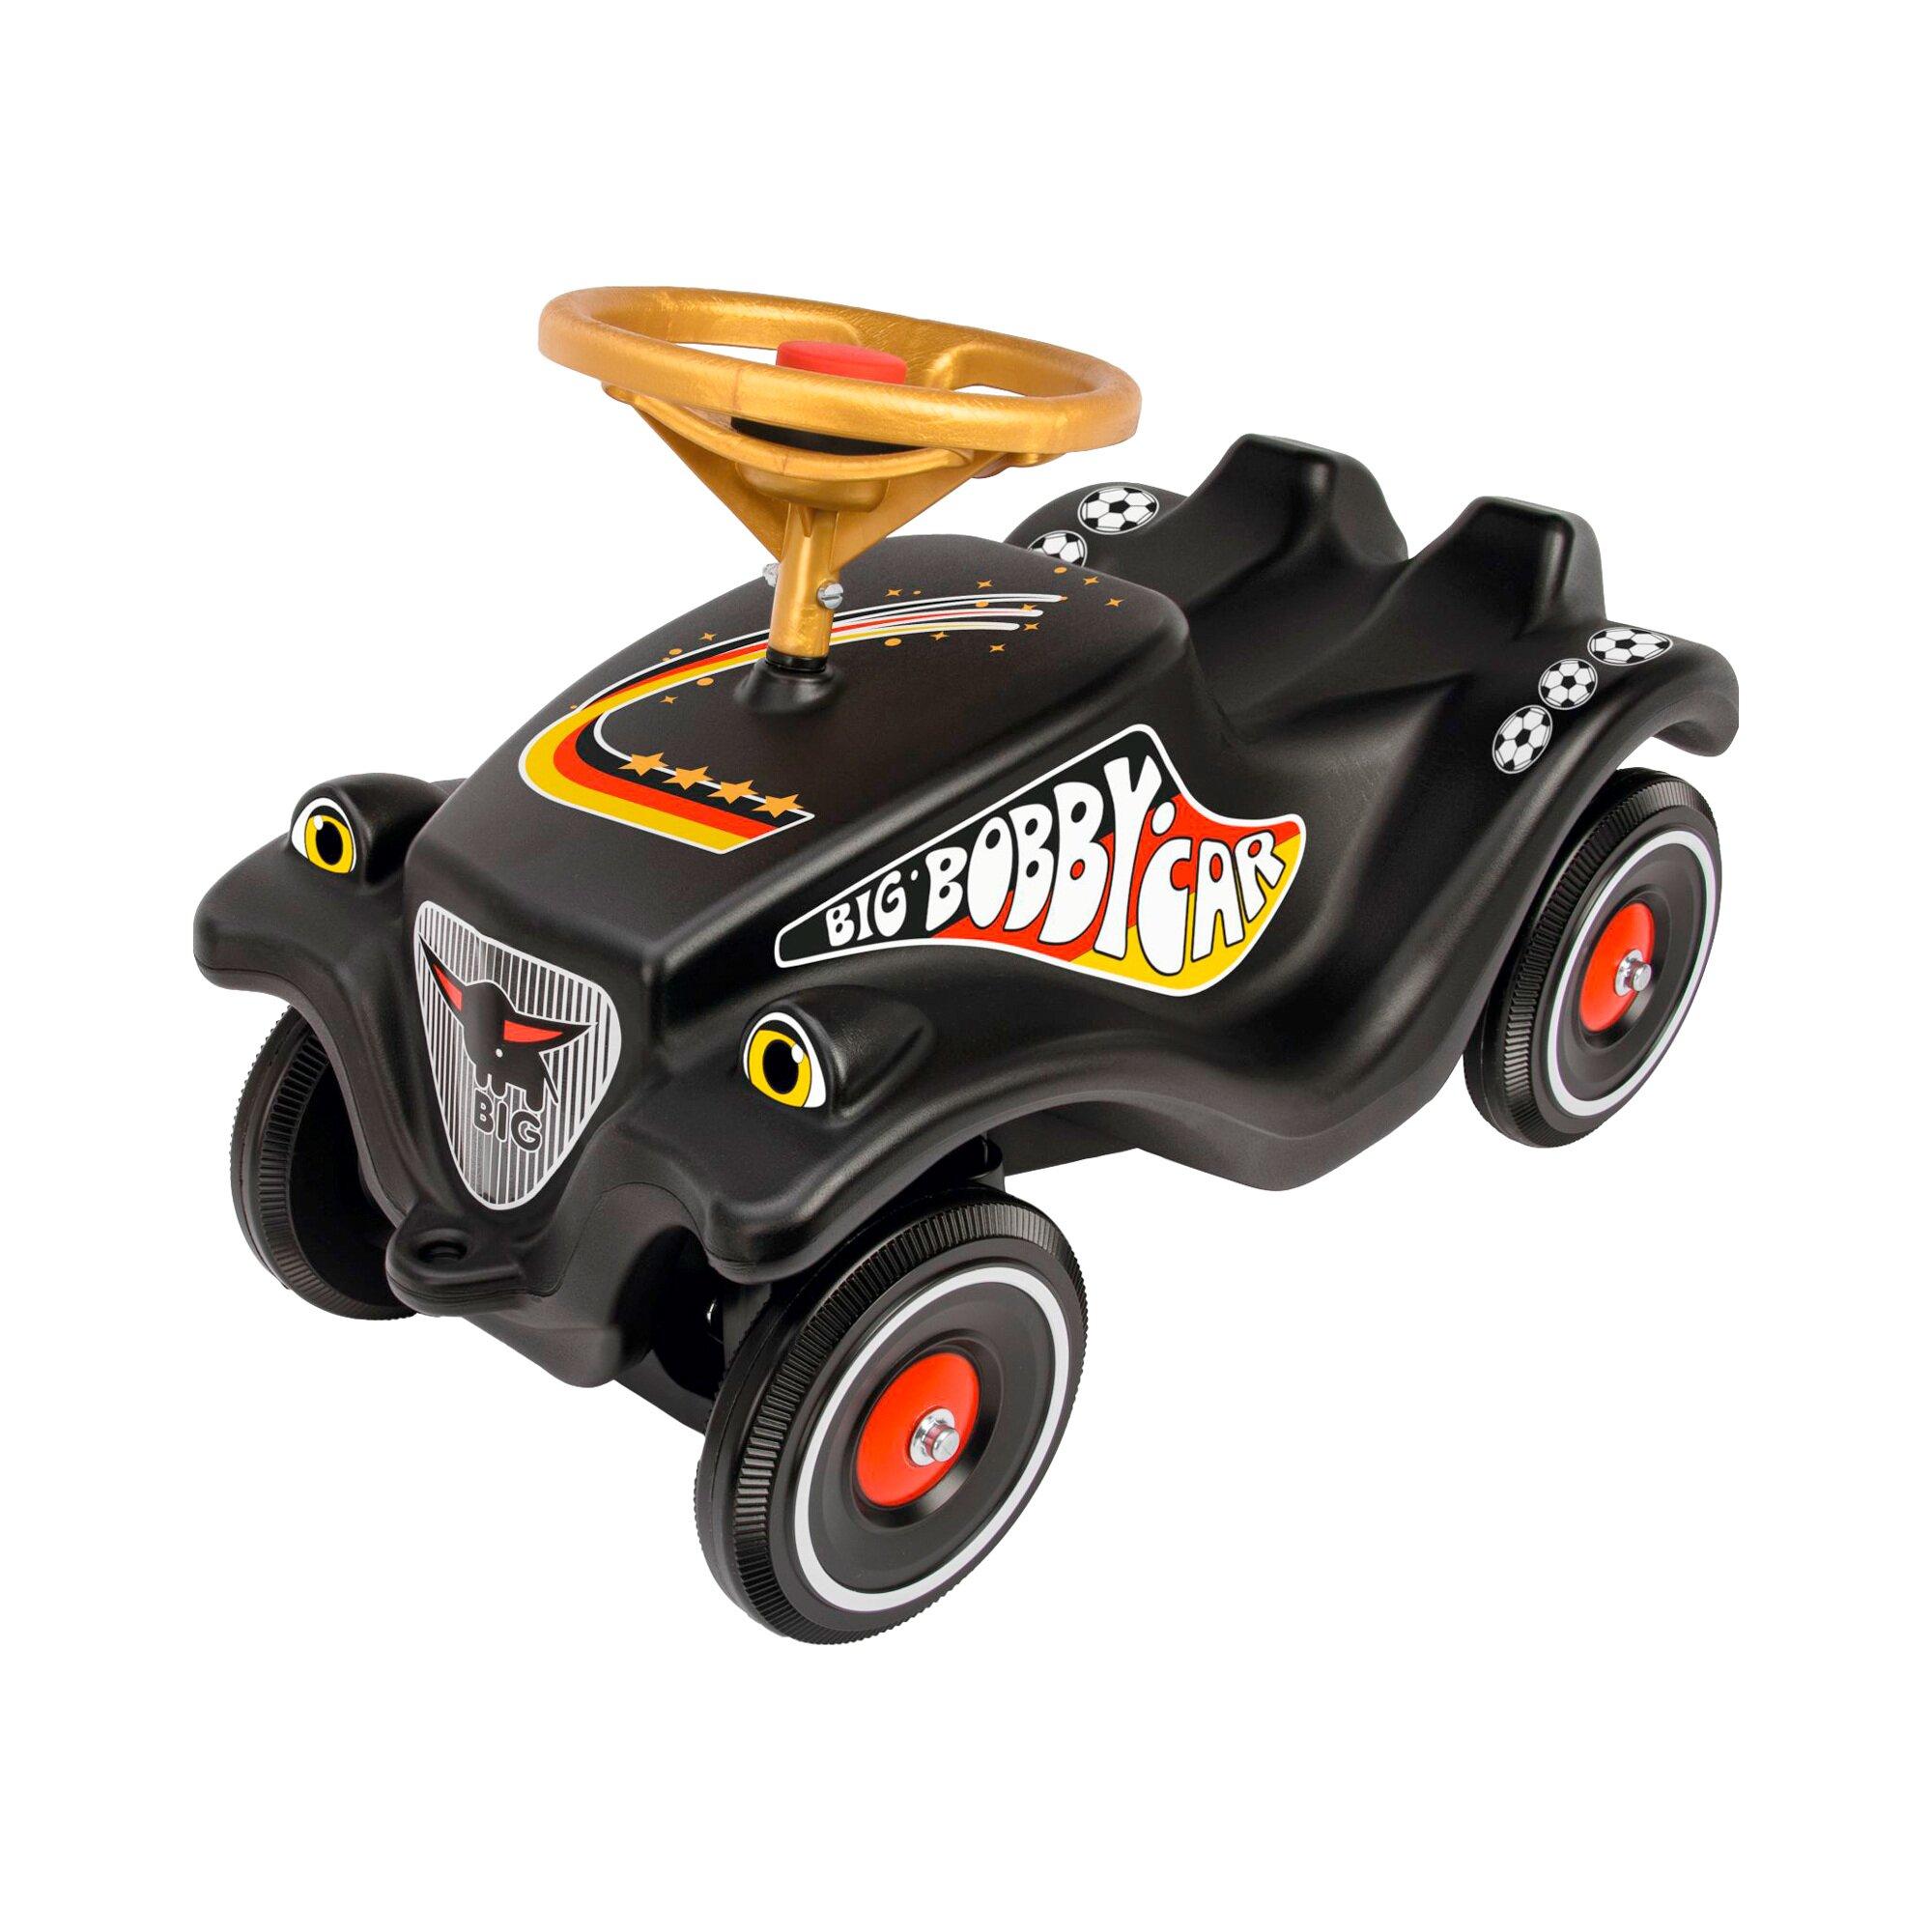 big-bobby-car-classic-limited-edition